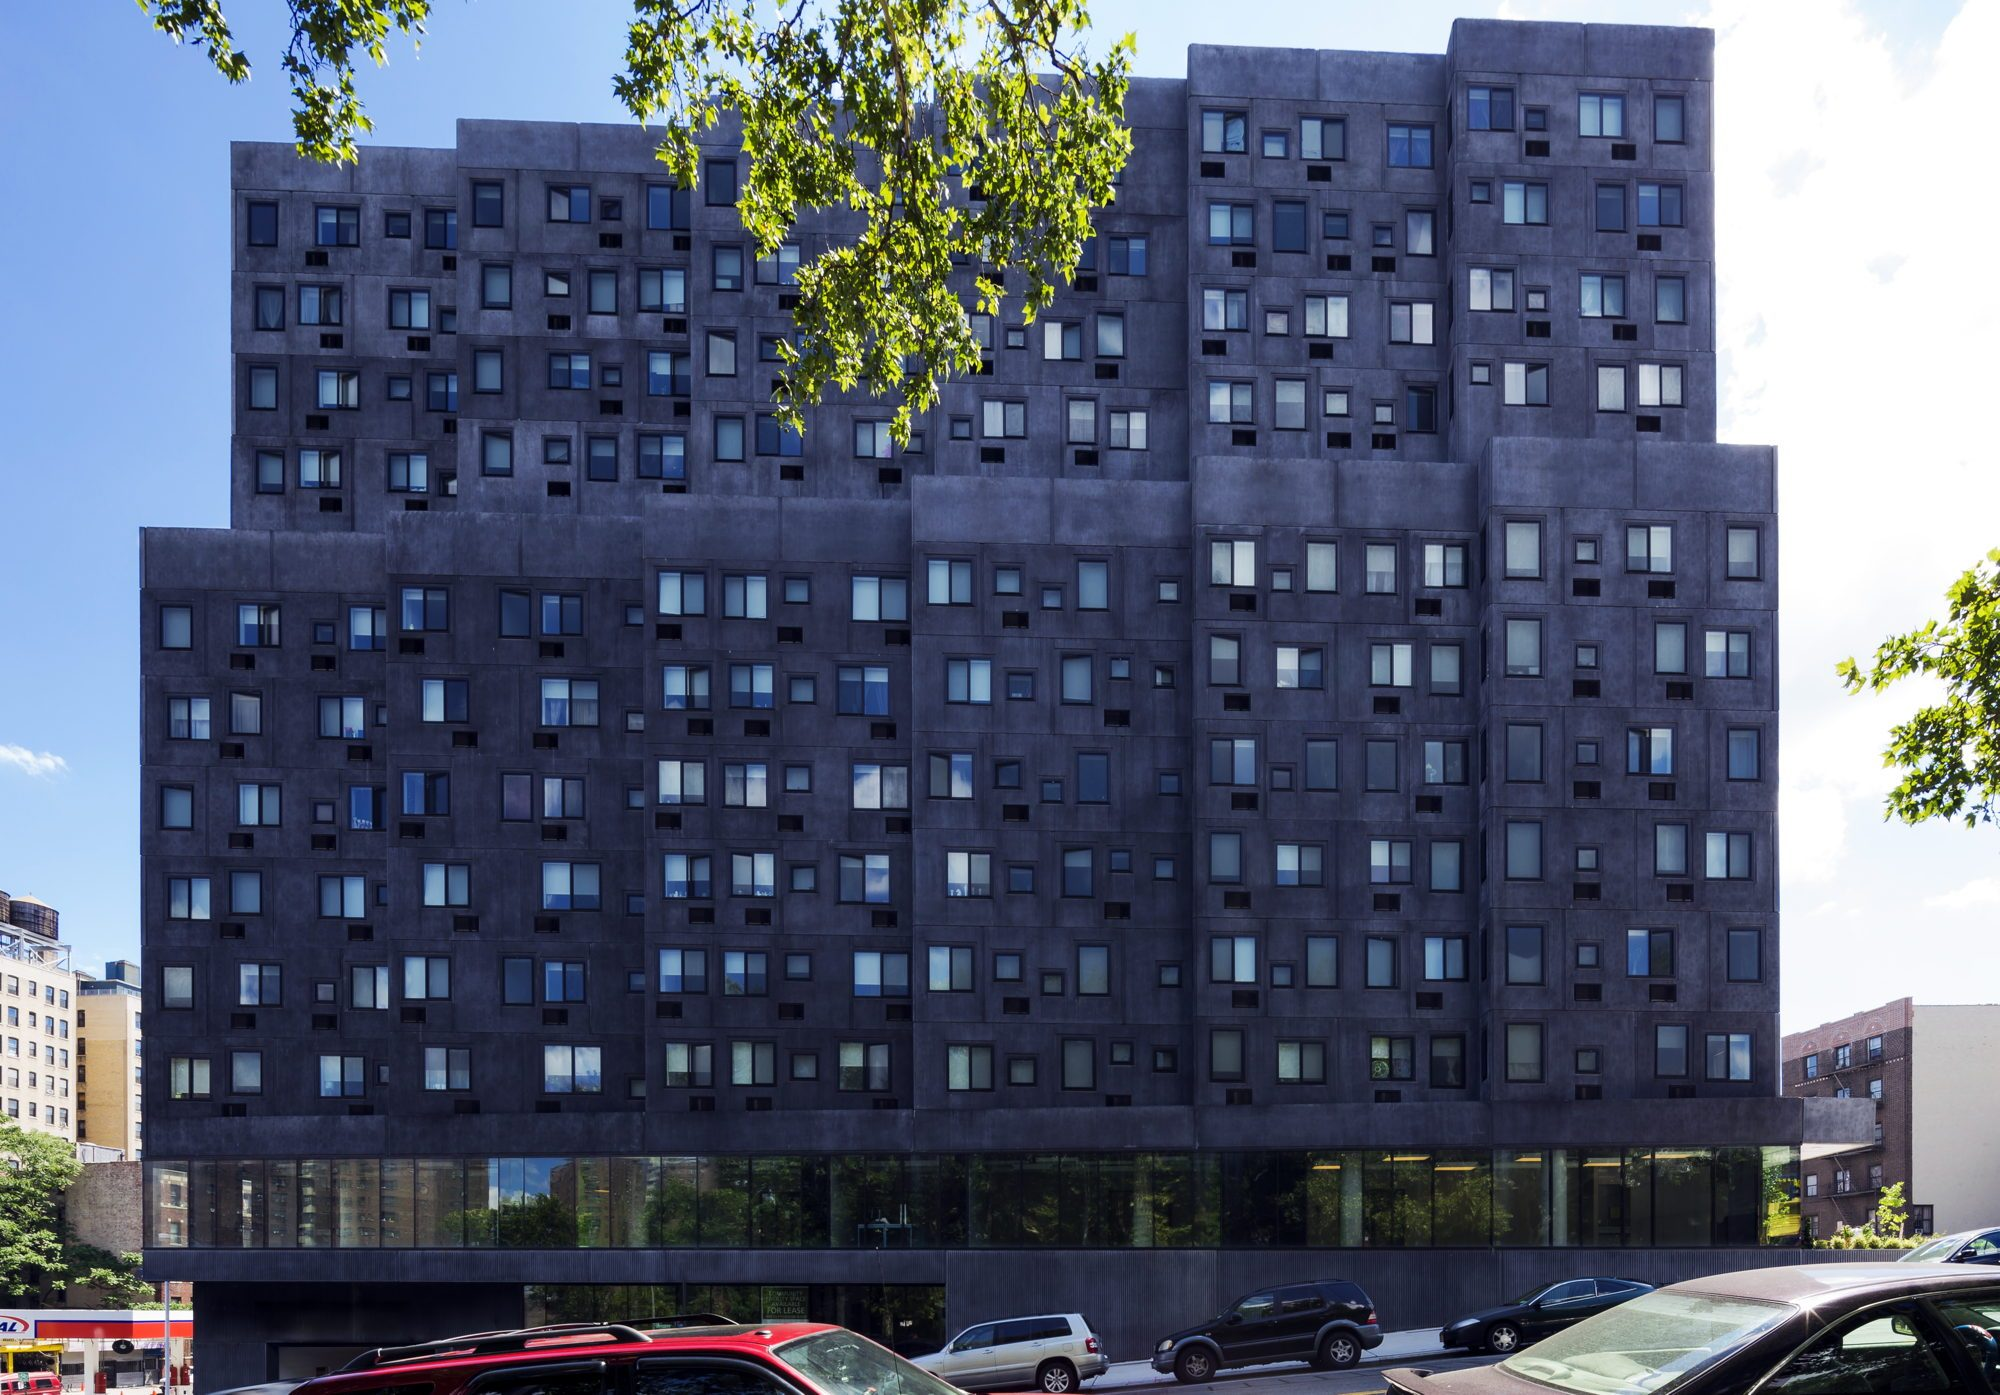 David Adjaye's Sugar Hill Housing Development in New York City's Harlem neighborhood.